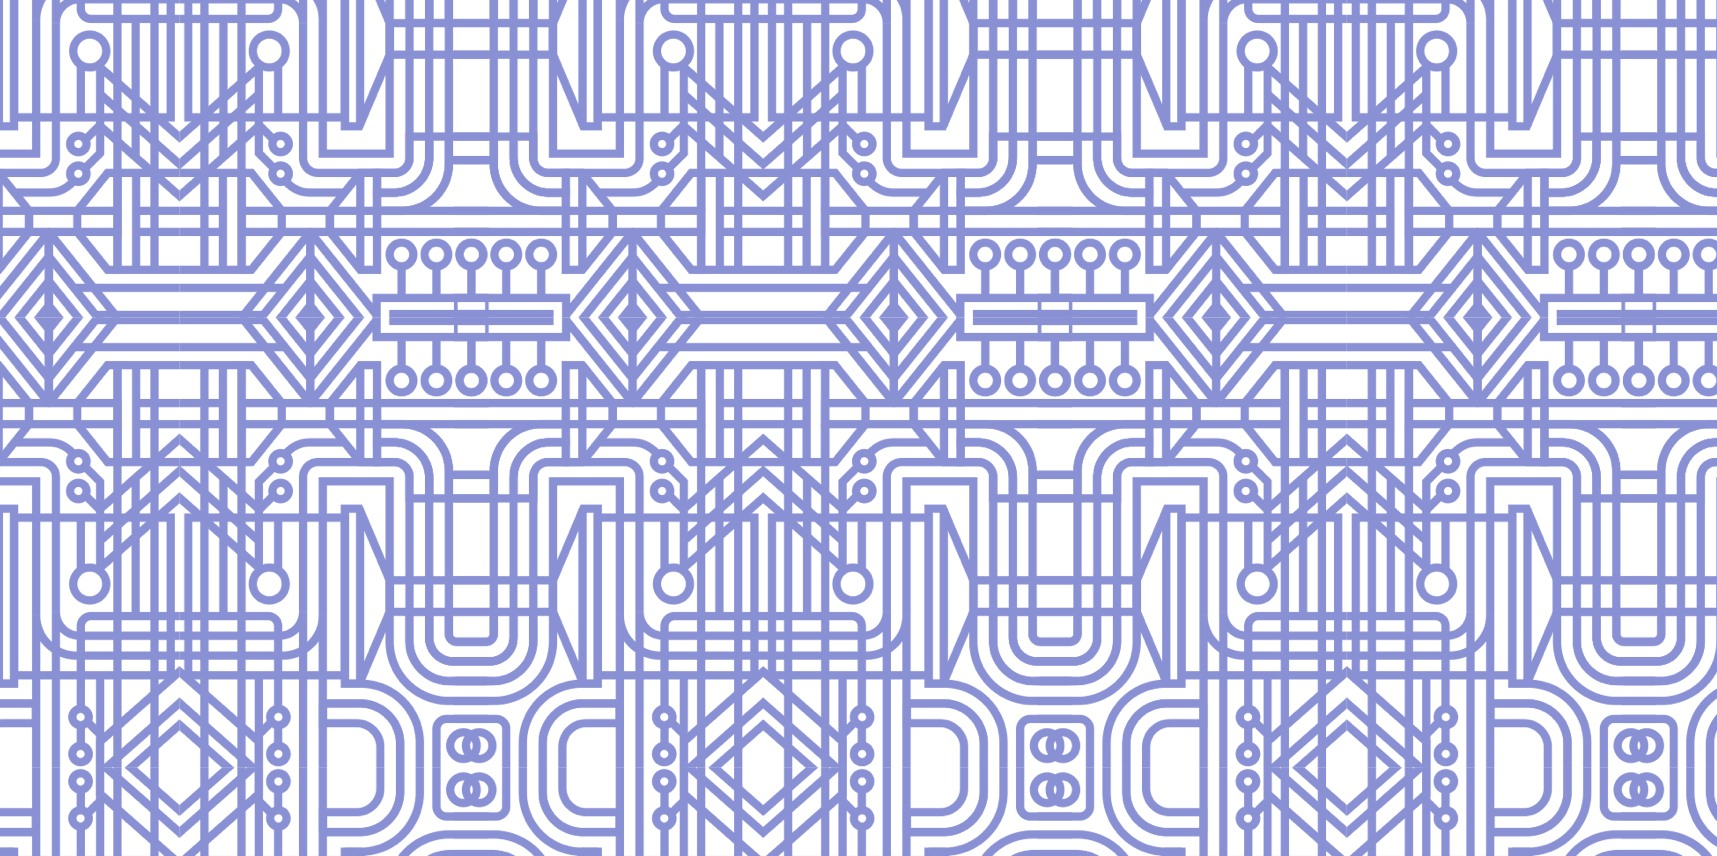 Computer pattern